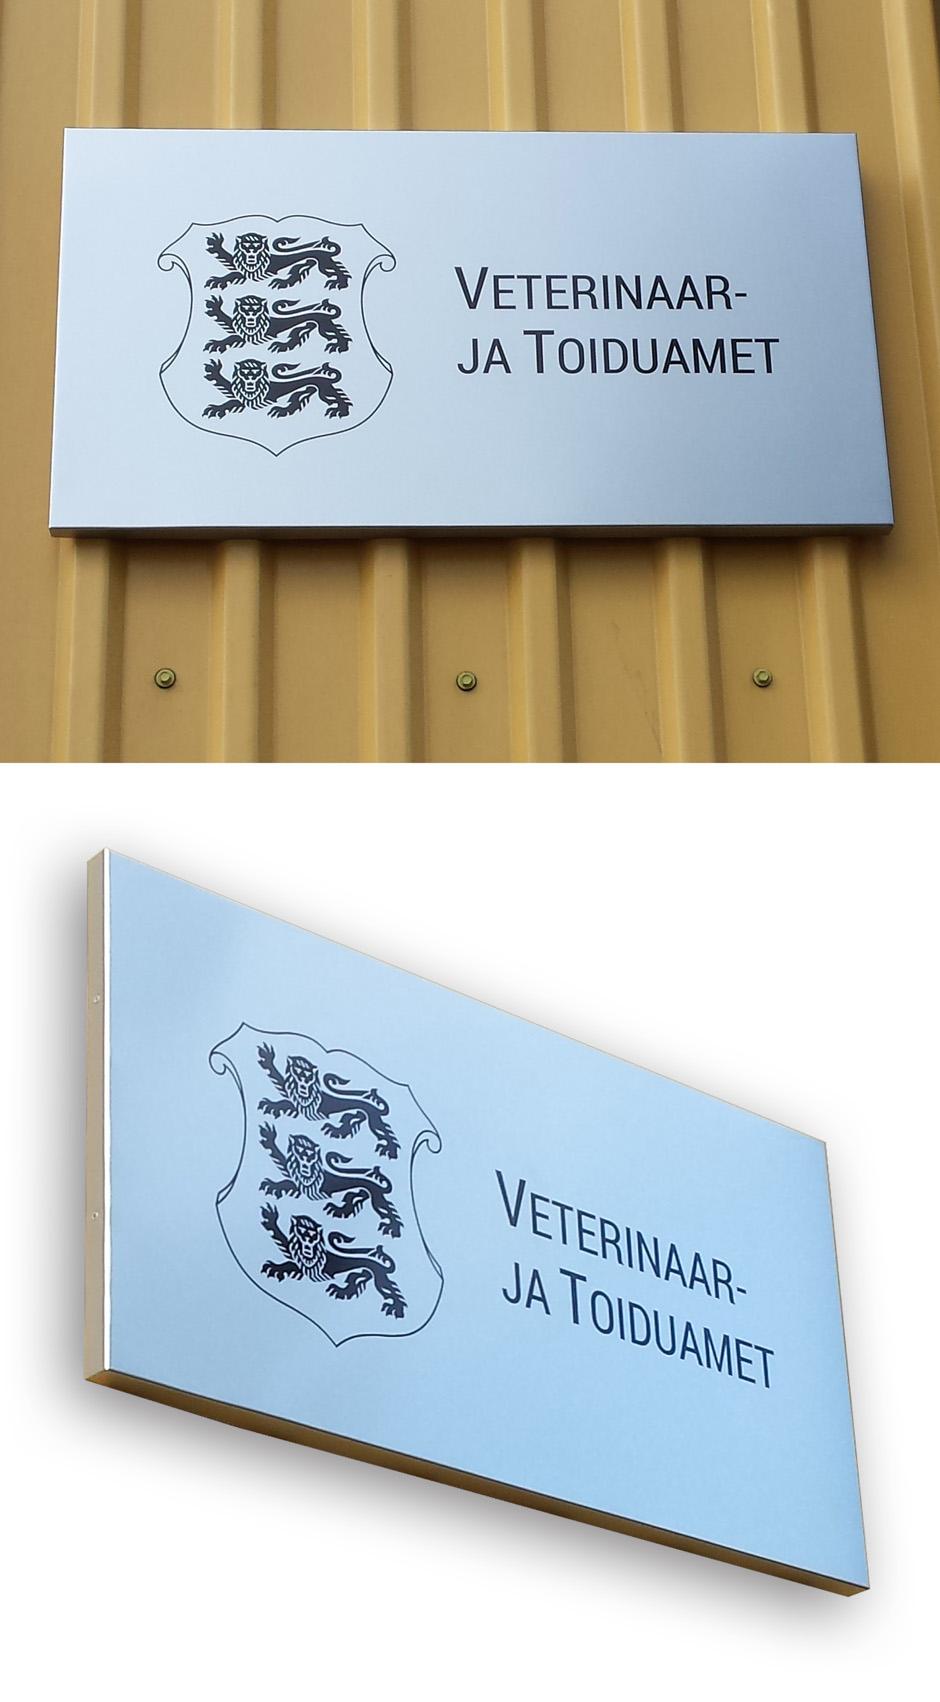 Veterinaar_ja_toiduamet